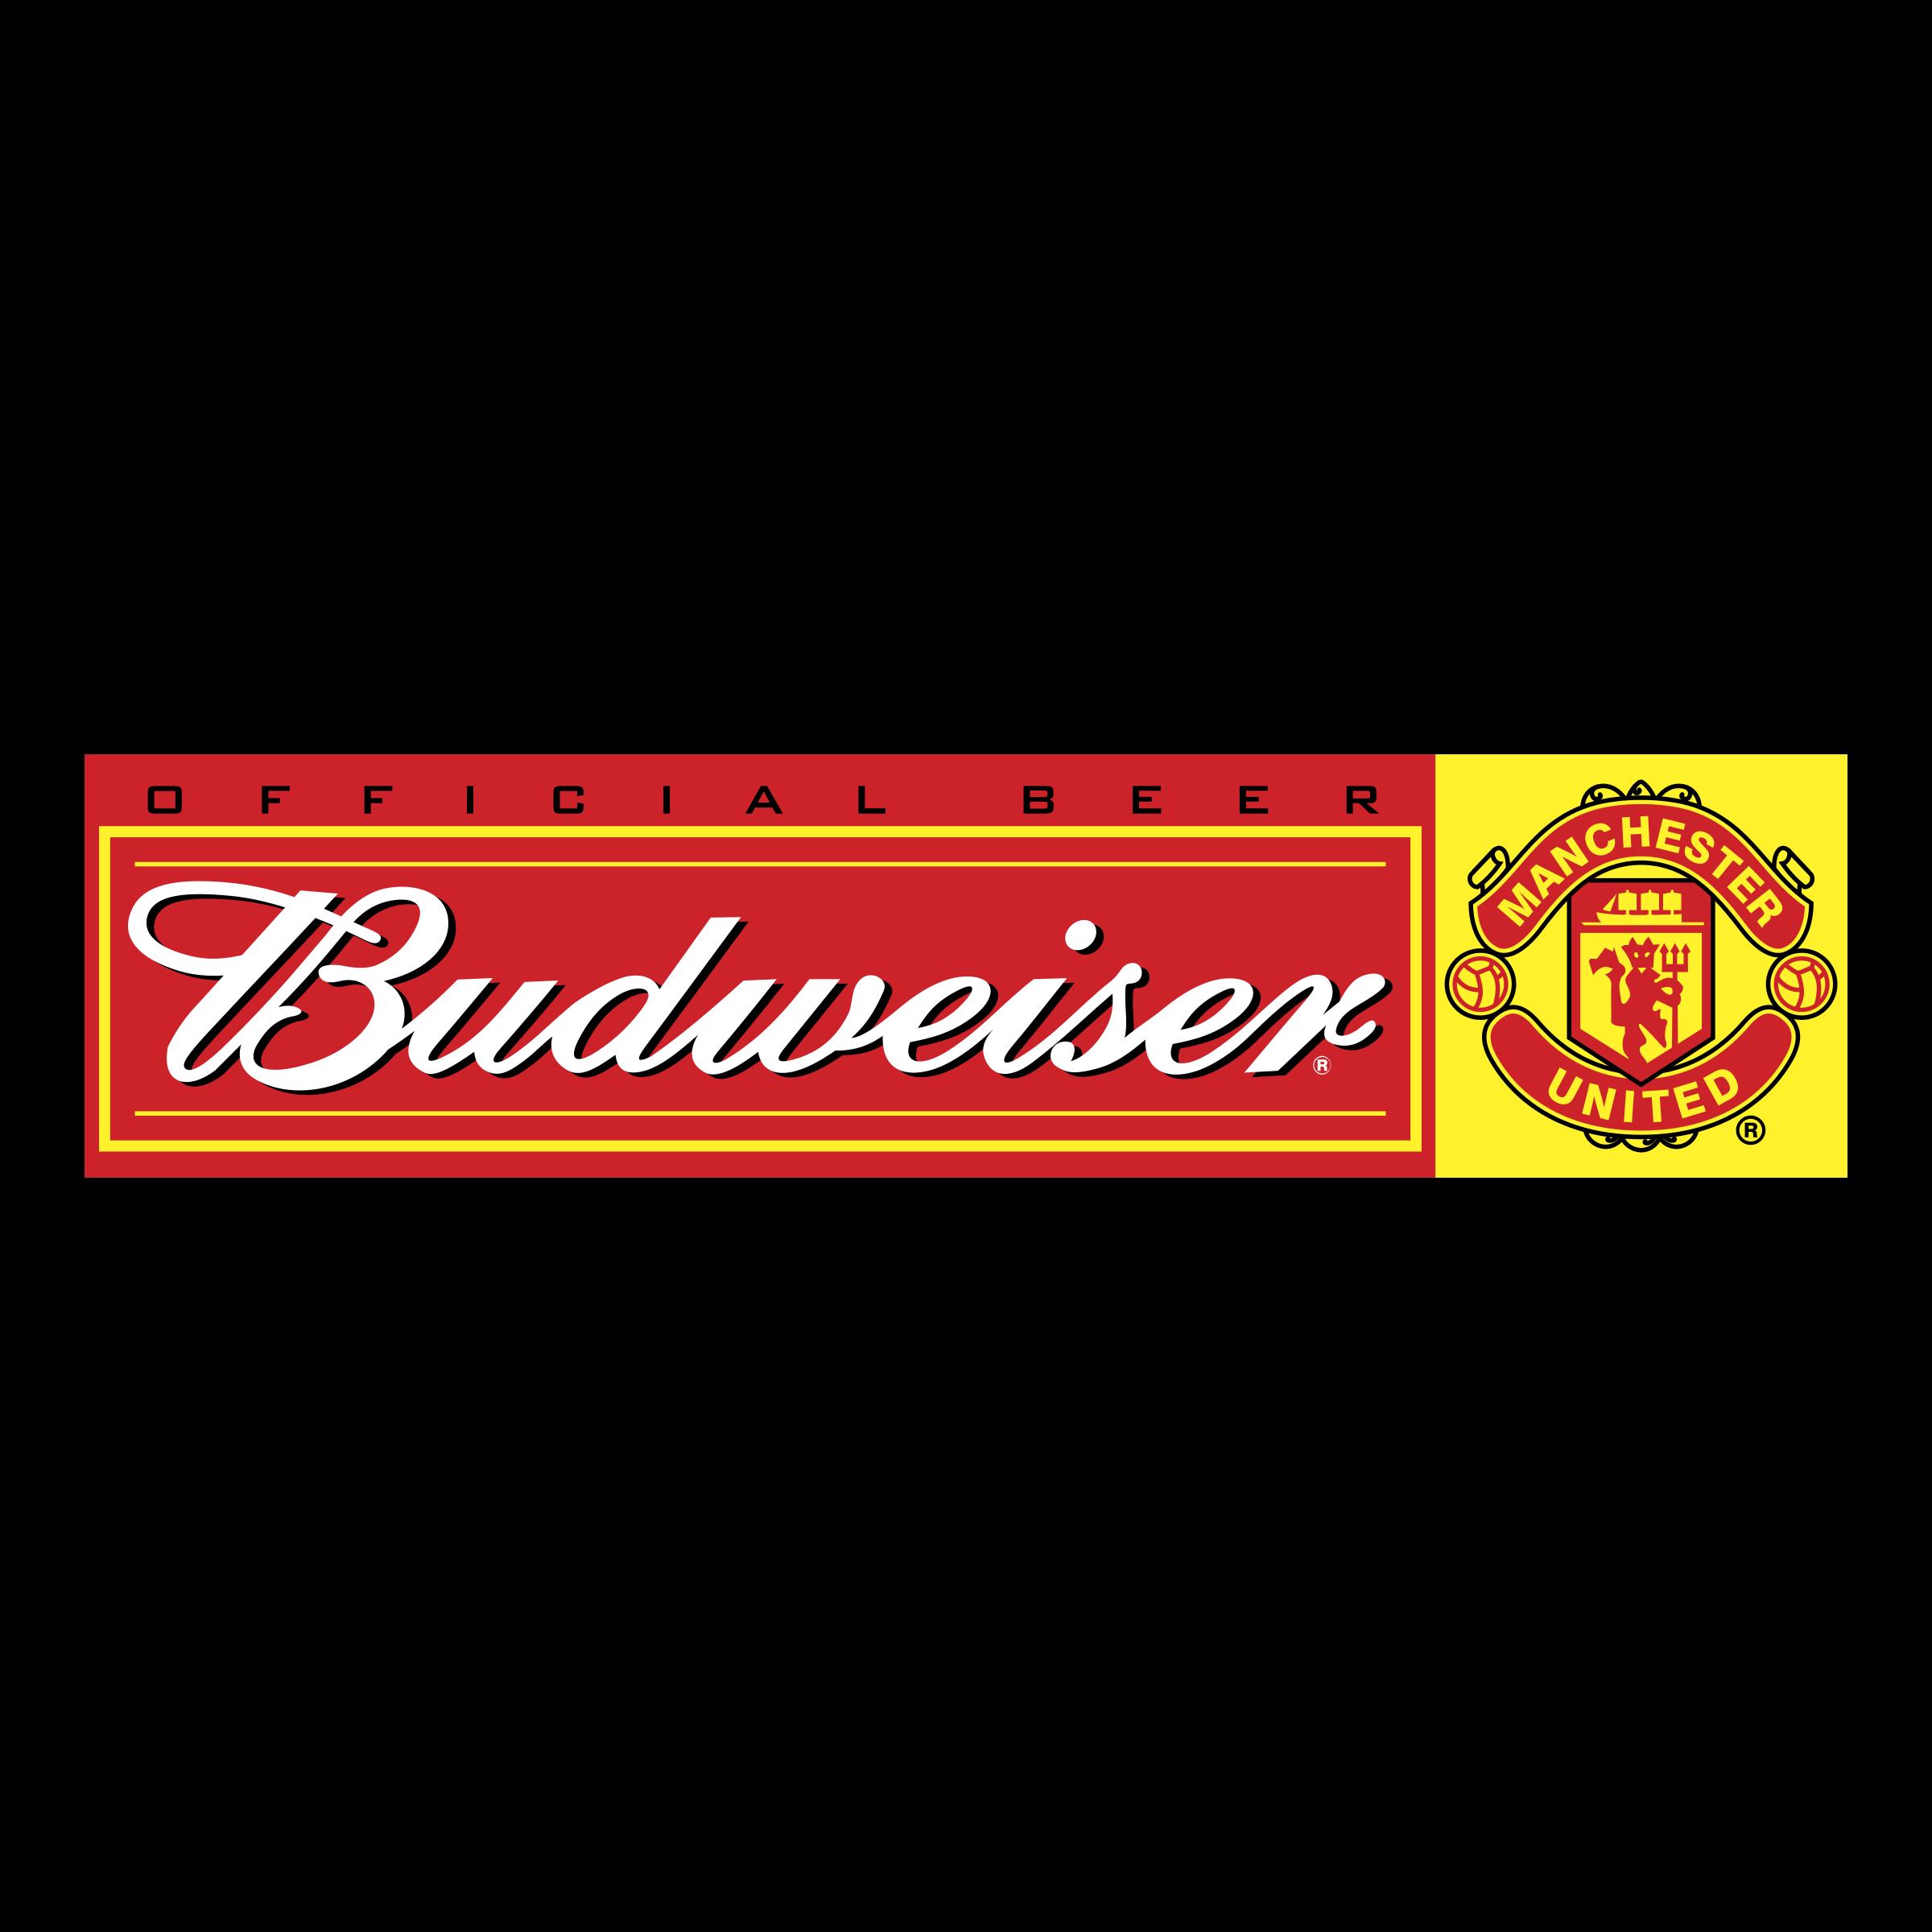 Budweiser Manchester United Logo Png Transparent Svg Vector Freebie Supply